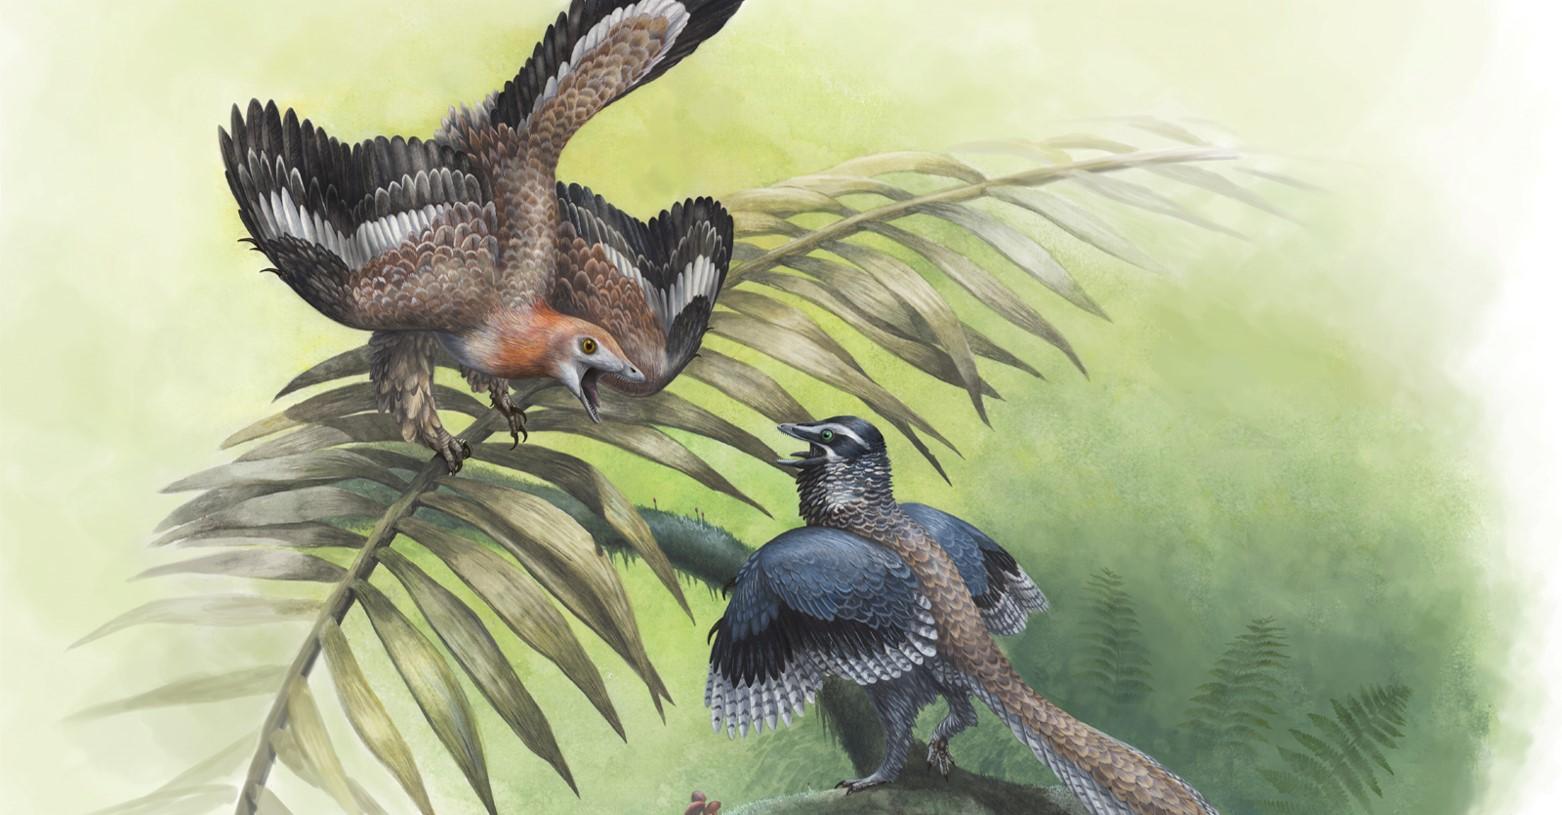 archaeopteryx_kihivoja_fb.jpg